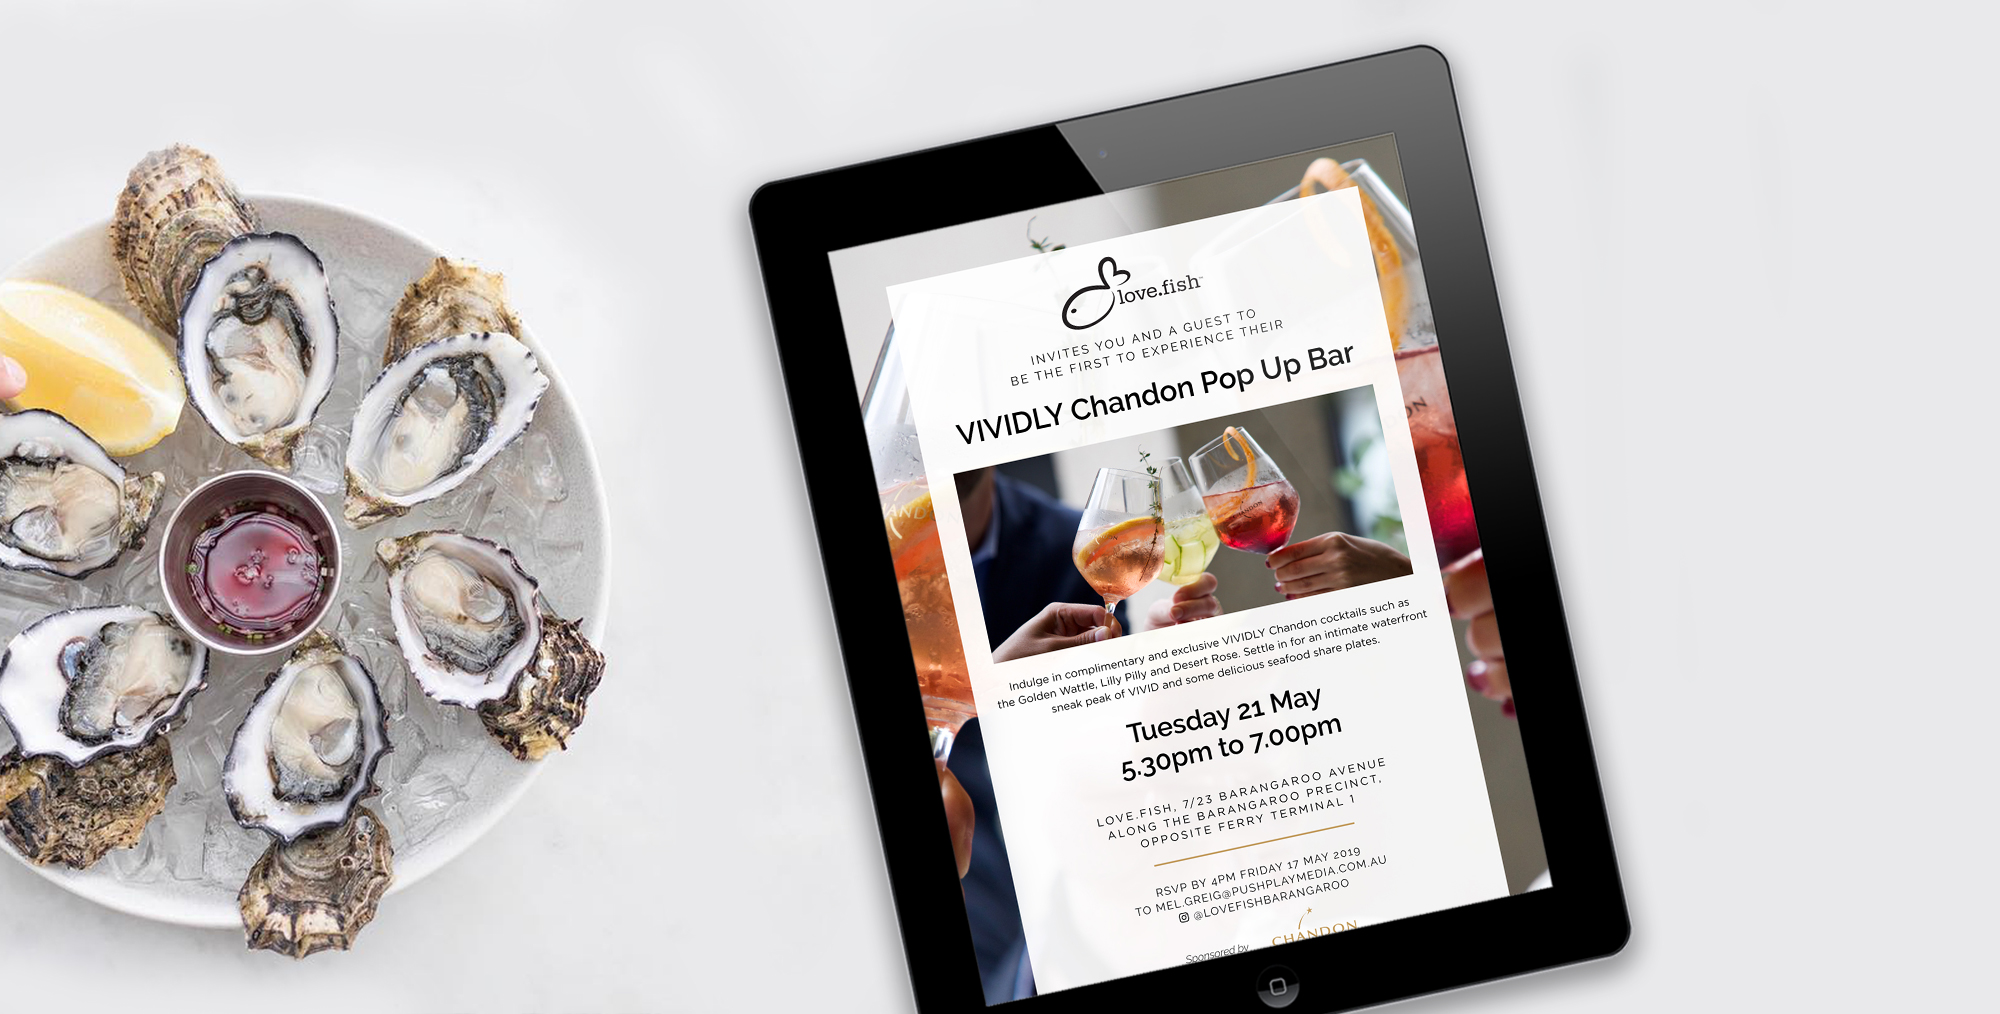 love fish digital email invite design chandon event vivid sydney